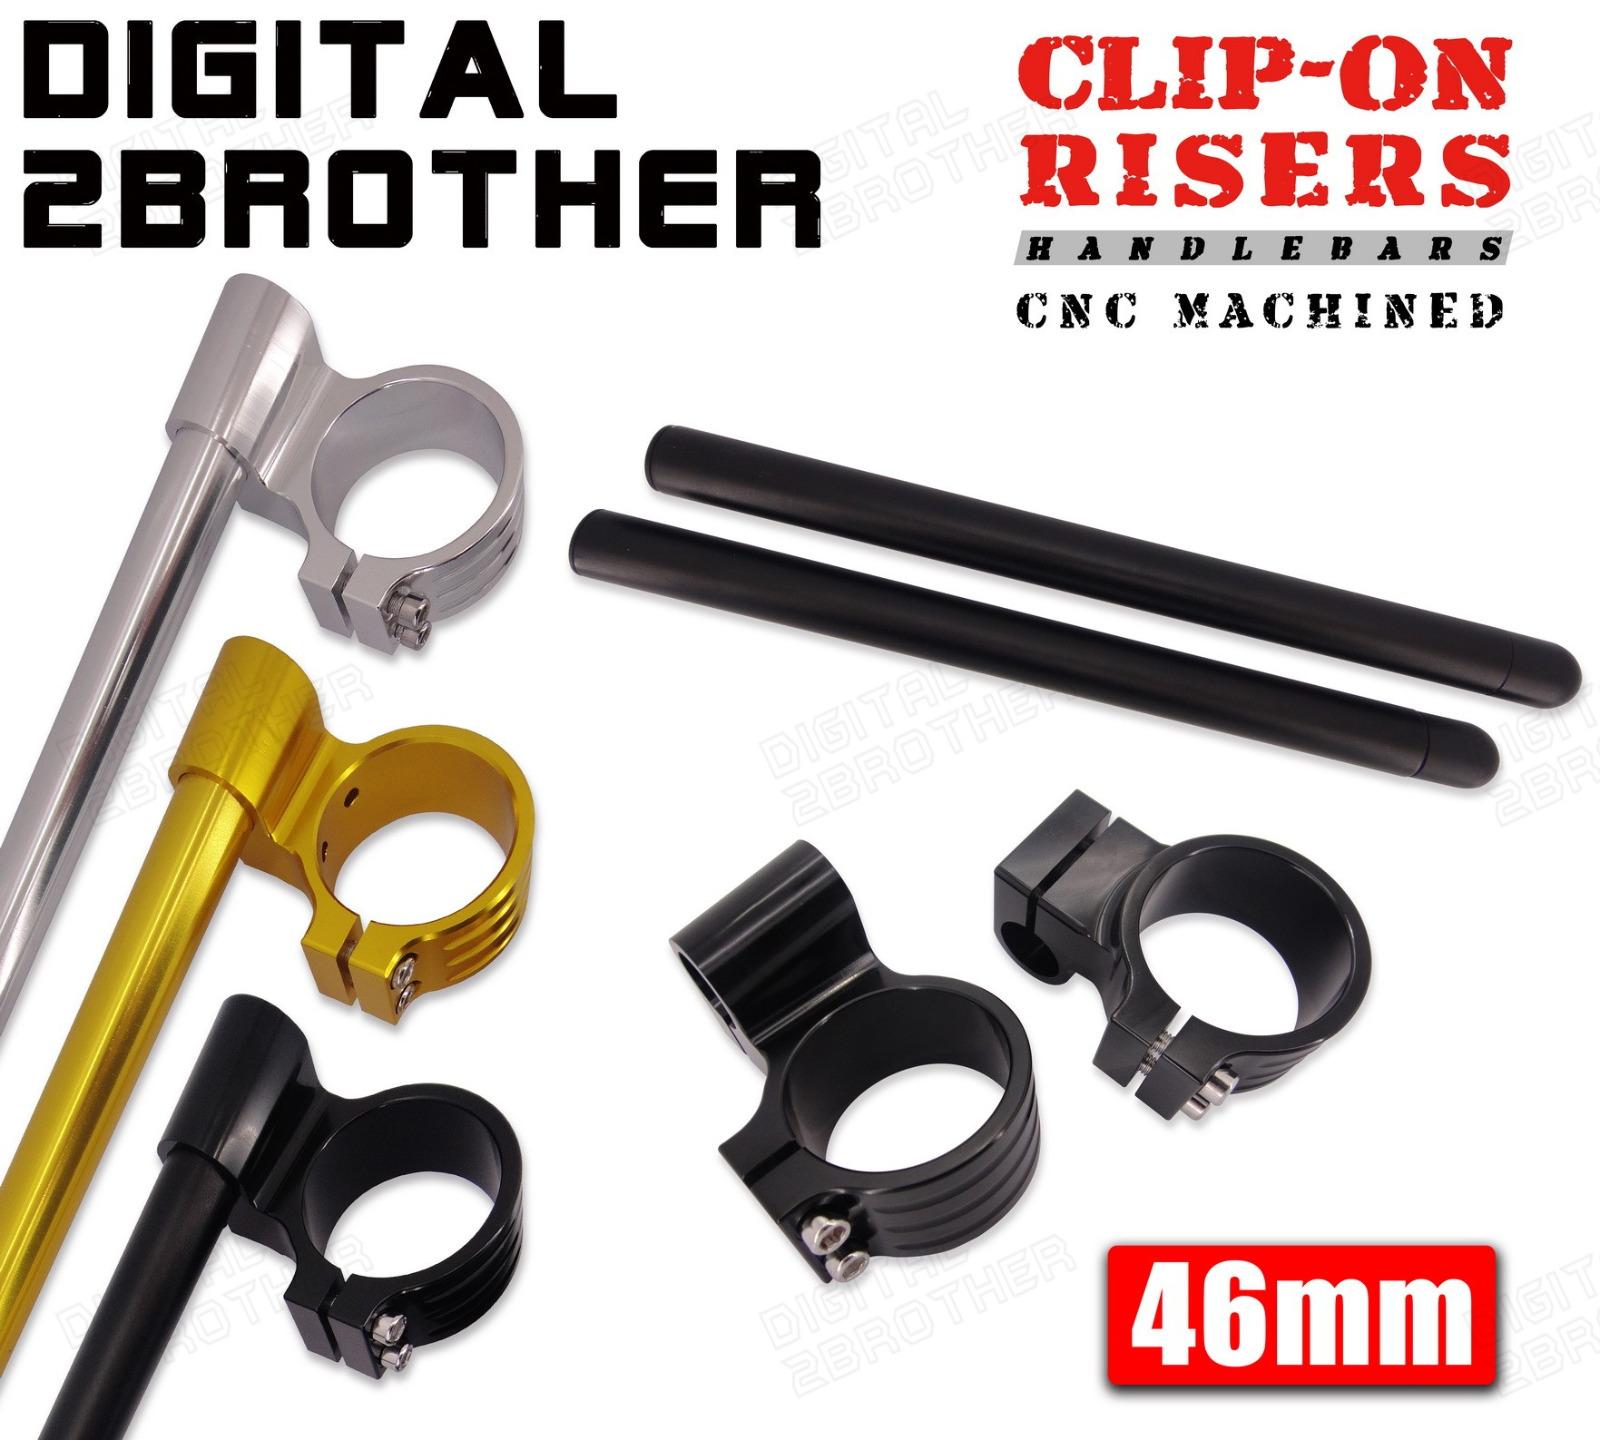 BLK 46mm CNC Clip-on Handlebars For Kawasaki Ninja ZX6R ZX9R 1998-2002 99 00 01